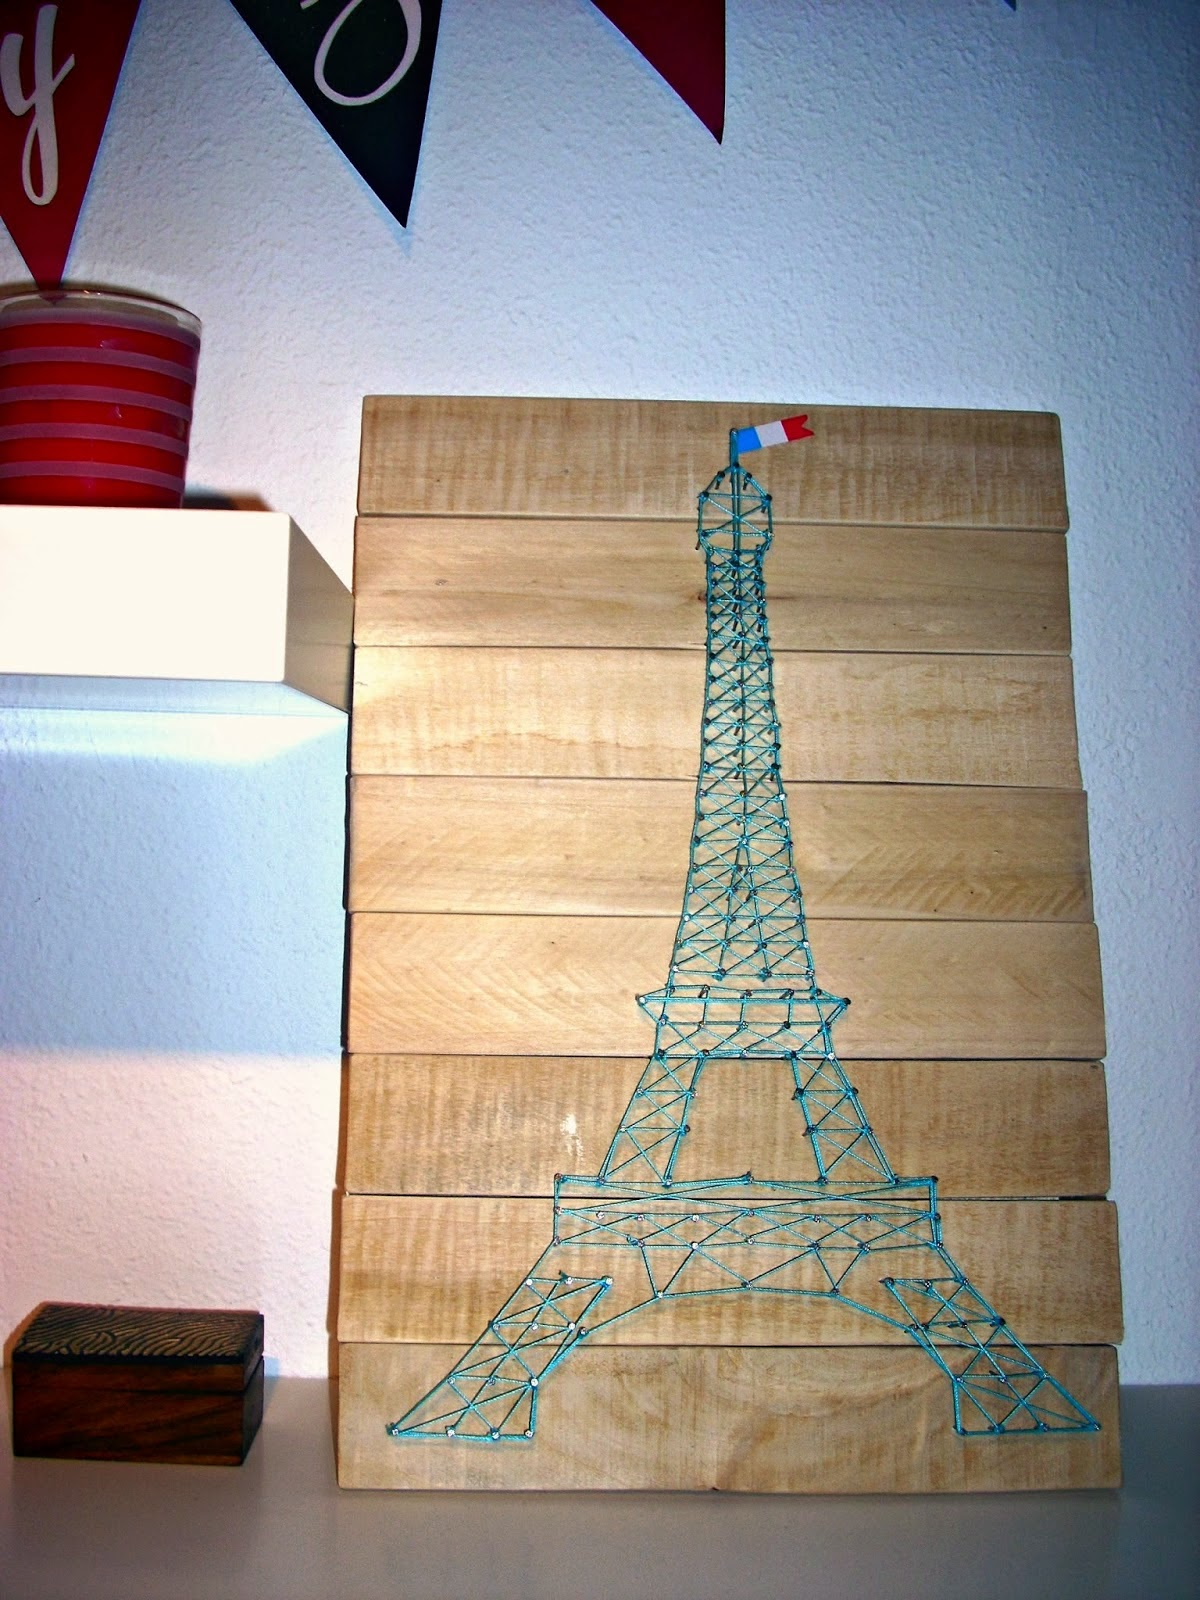 http://labuhardilladesign.blogspot.com.es/2013/11/diy-haz-una-torre-eiffel-con-hilo.html